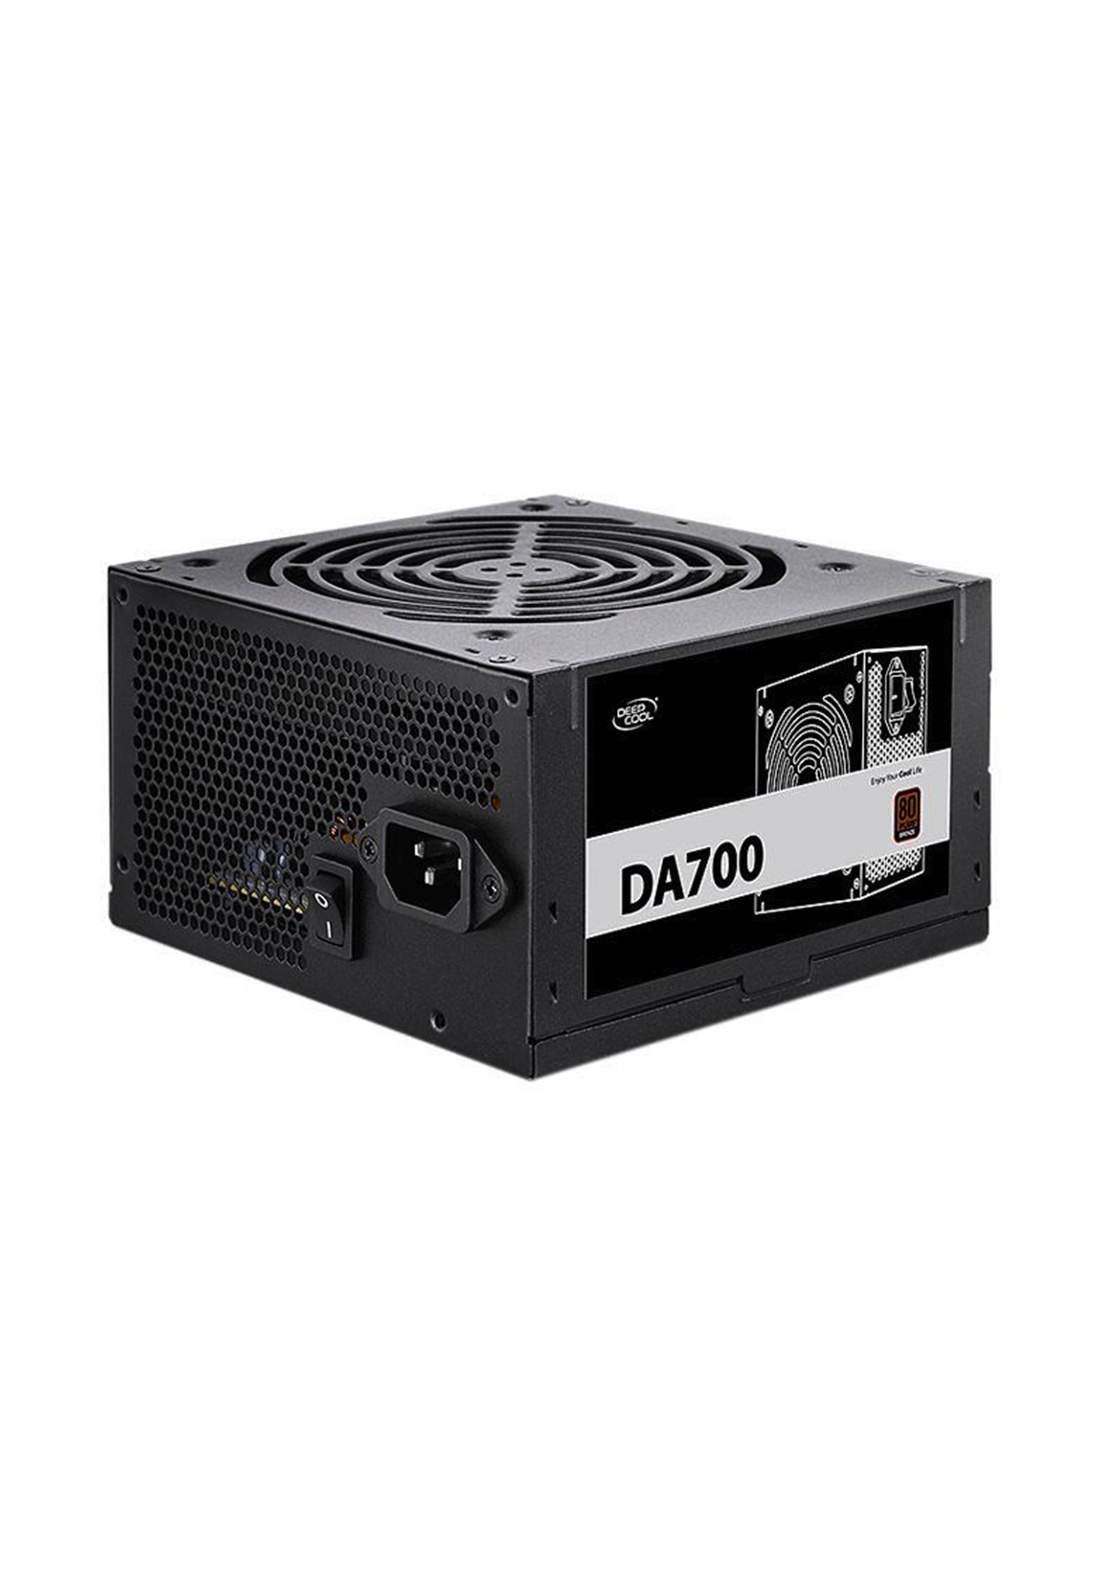 DeepCool DA700 80 Plus Bronze Certified 700W Power Supply - Black